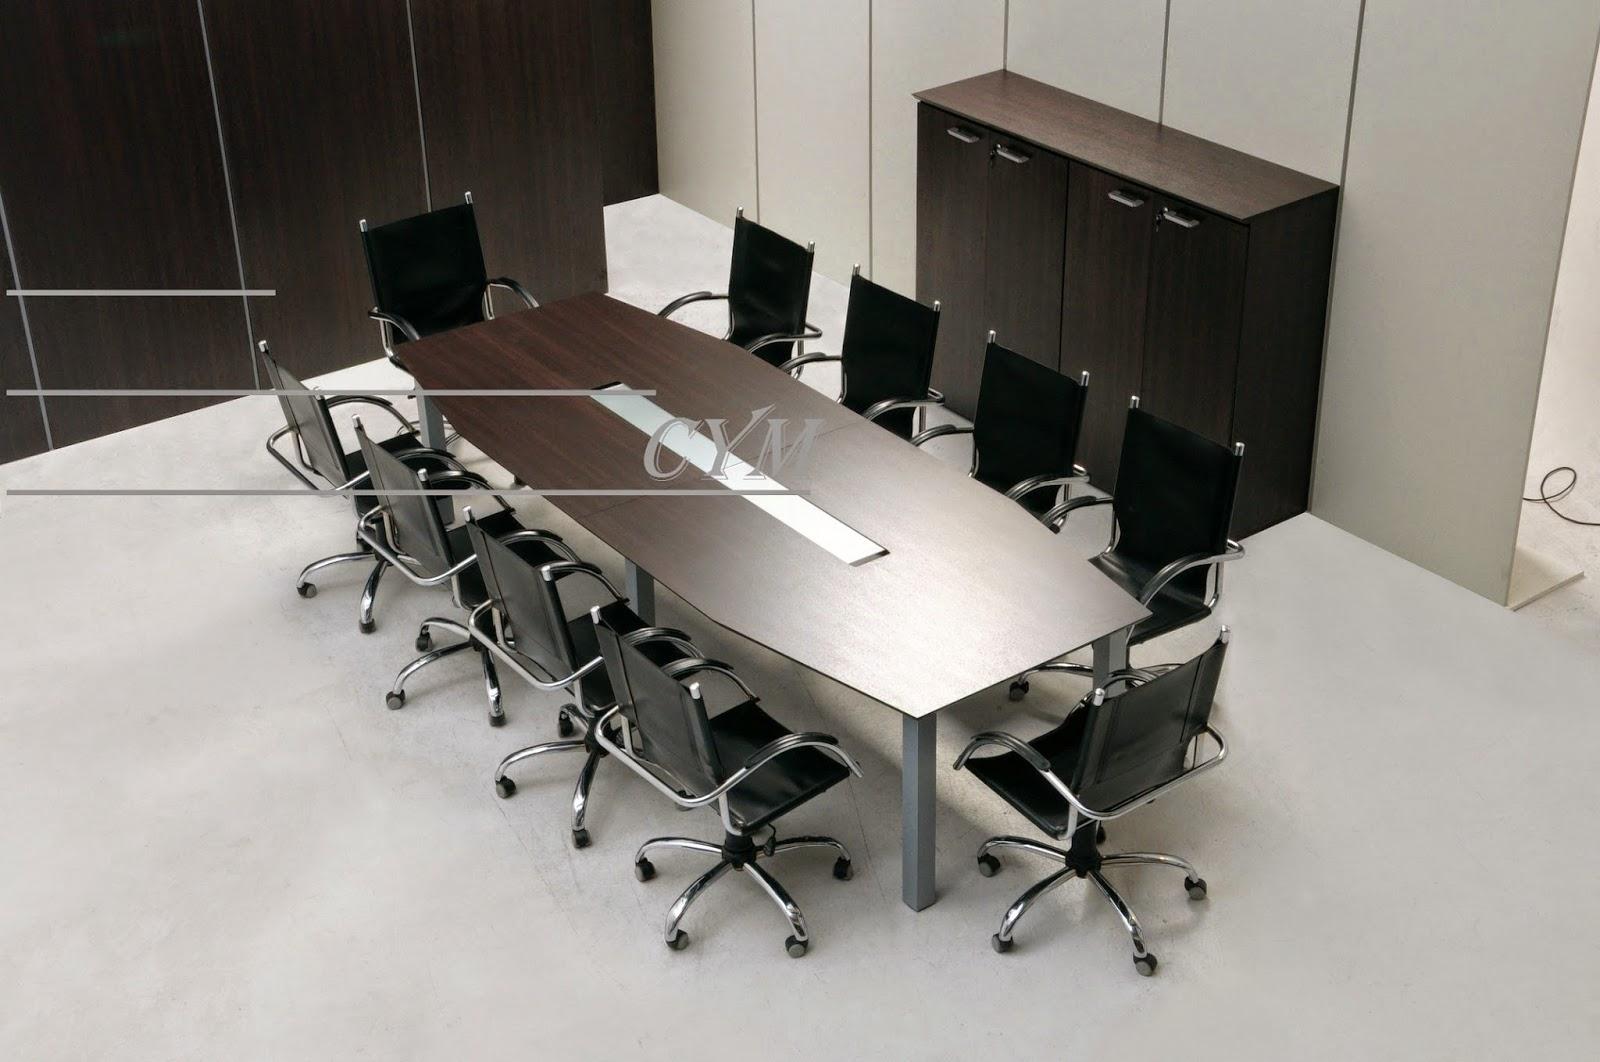 Muebles de oficina for Muebles de oficina concepto